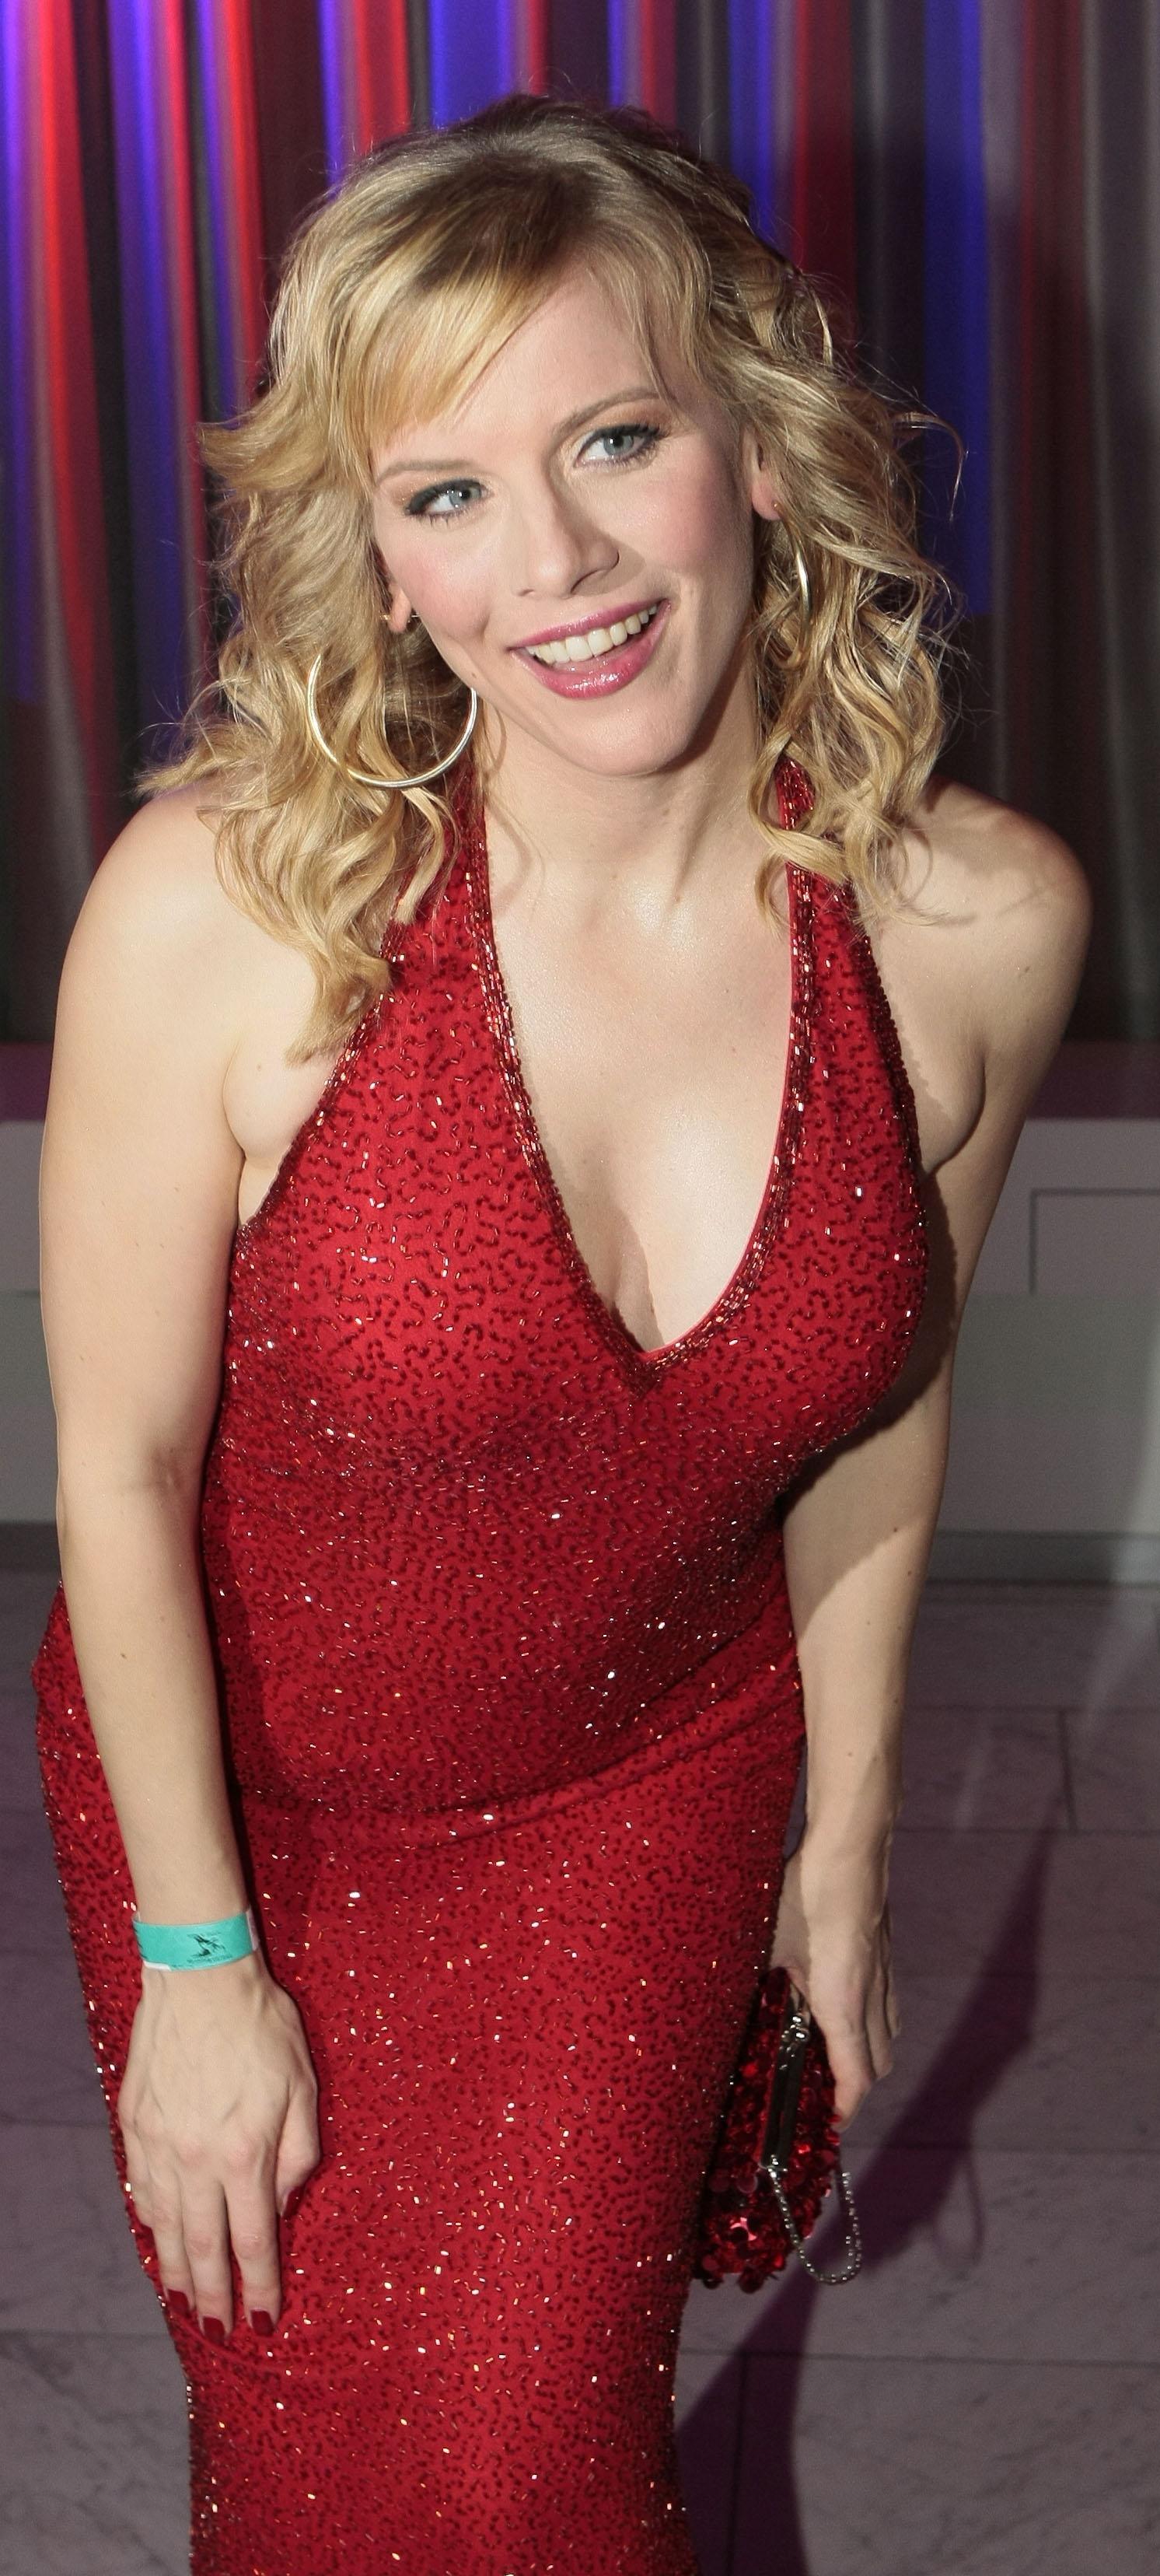 Eva Habermann Nude » SexyStars.online - Hottest Celebrity